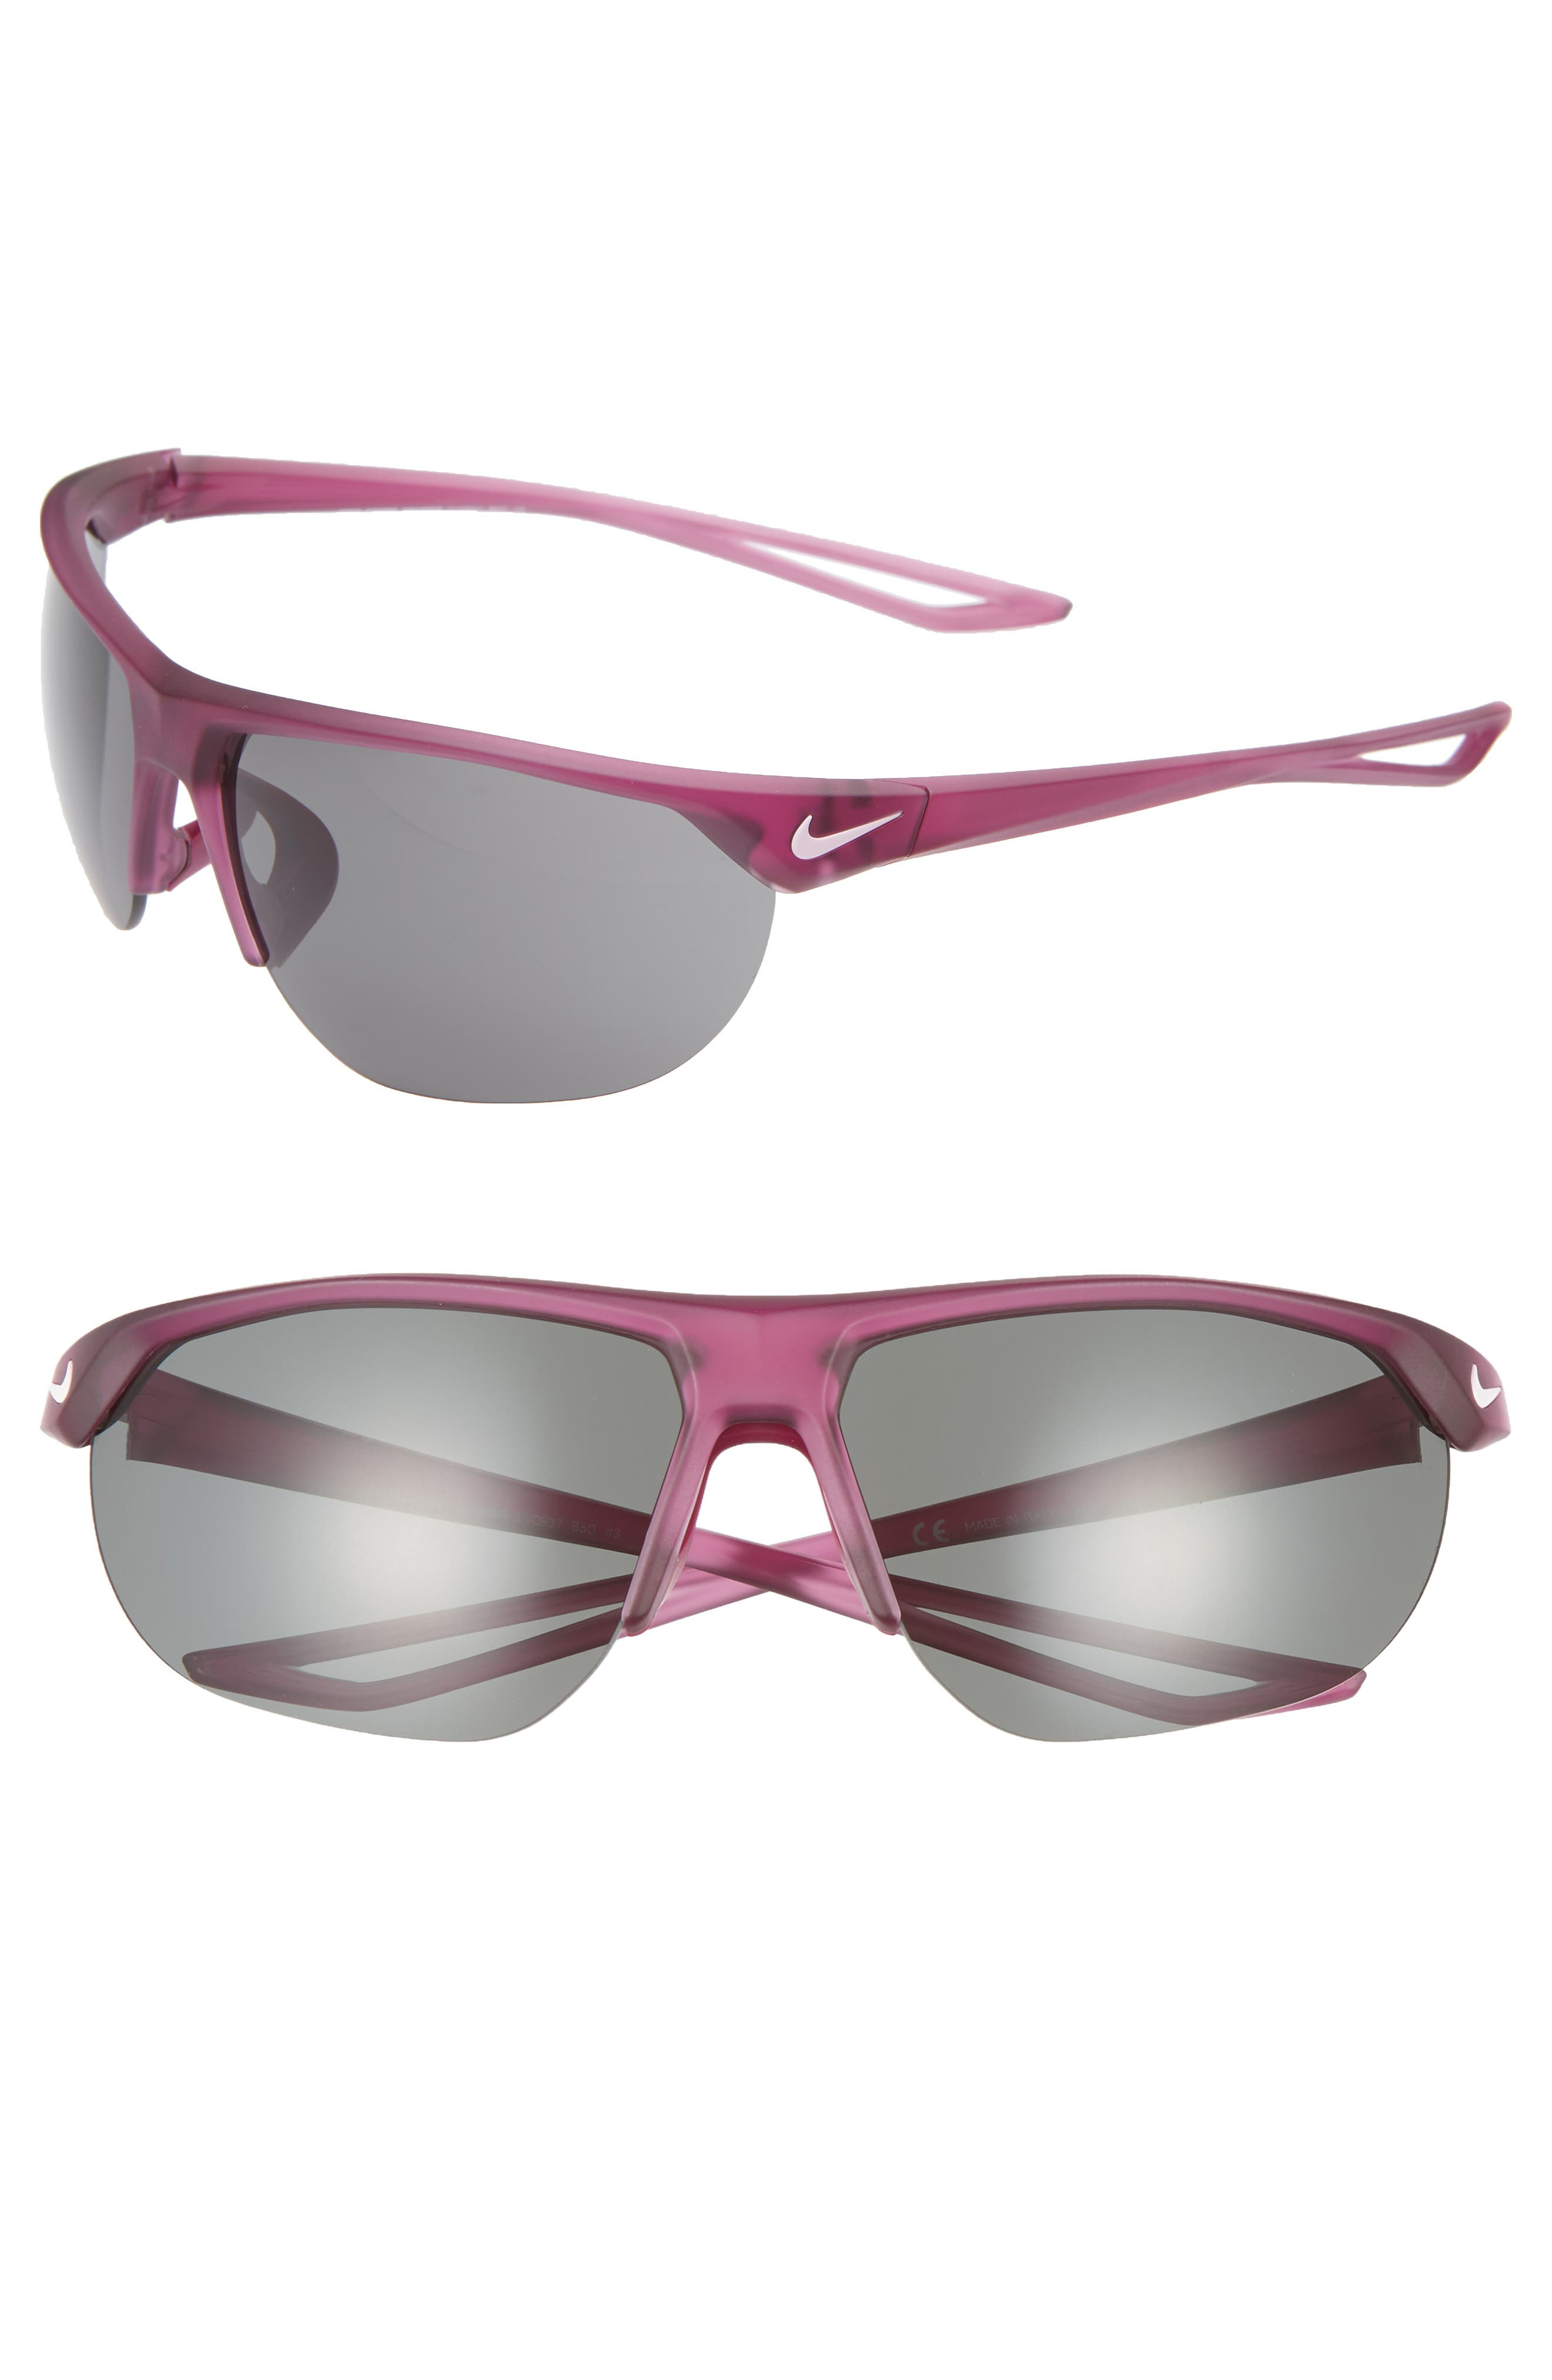 Nike Cross Trainer 67Mm Shield Sunglasses - Berry/ Dark Grey